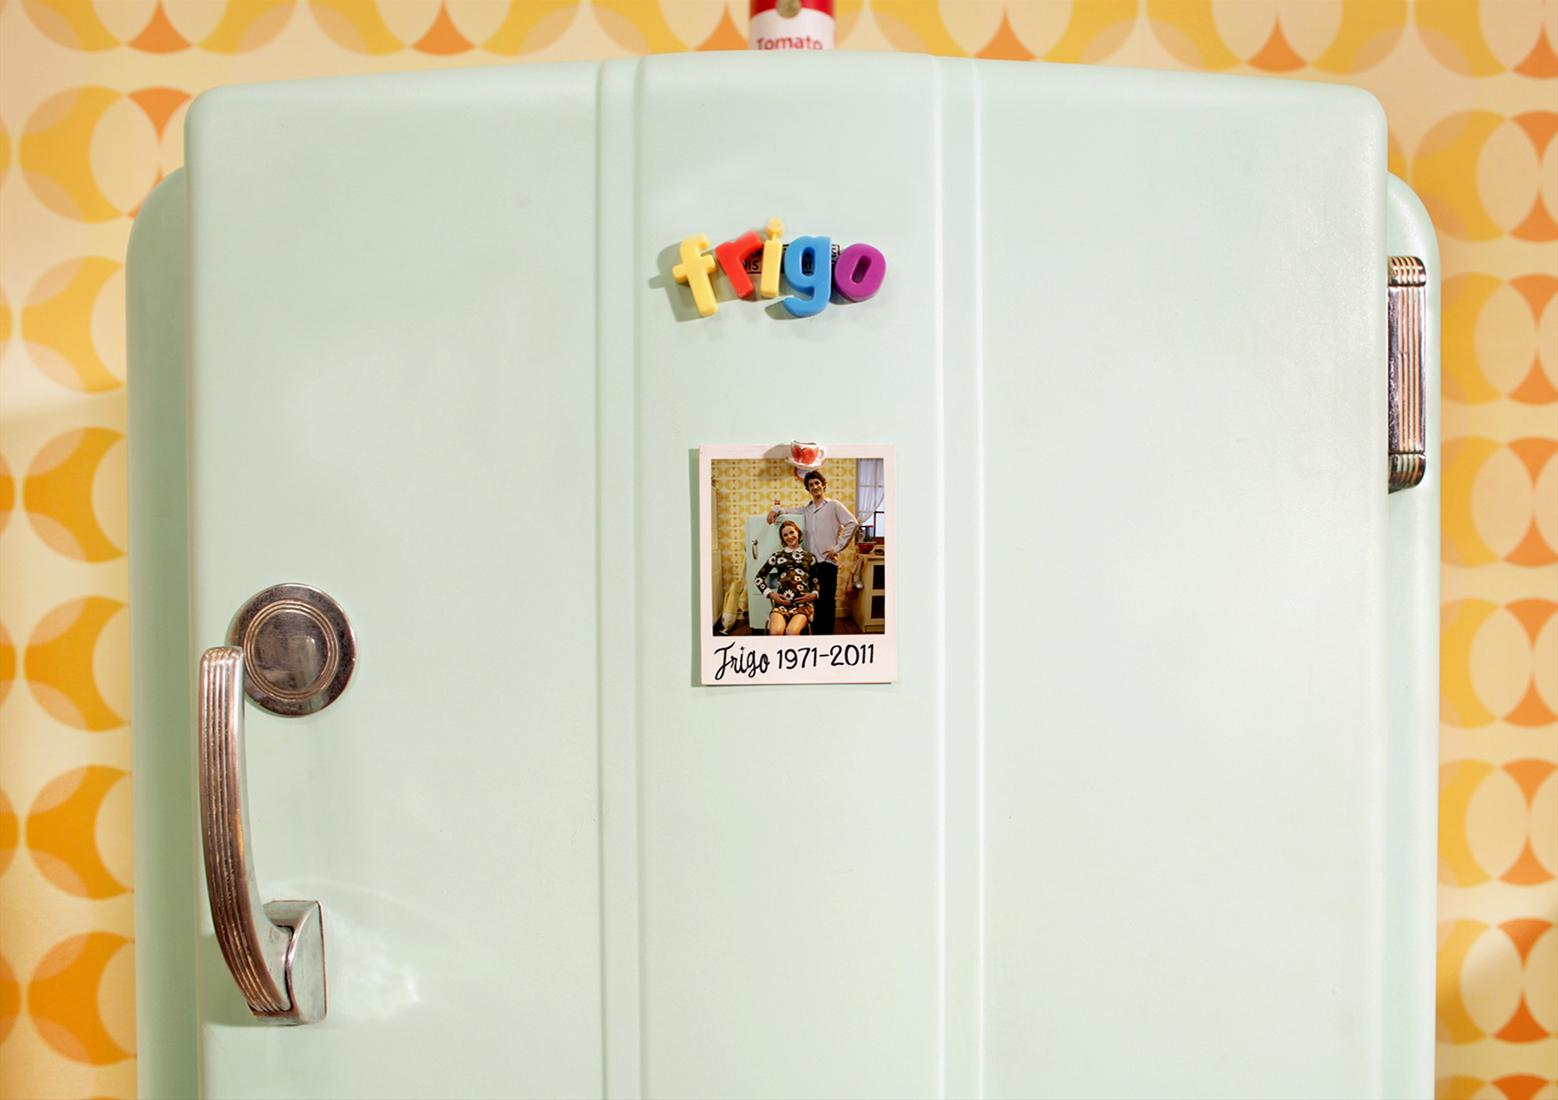 largeur d un frigo le frigo d un foyer cor en kimshii. Black Bedroom Furniture Sets. Home Design Ideas